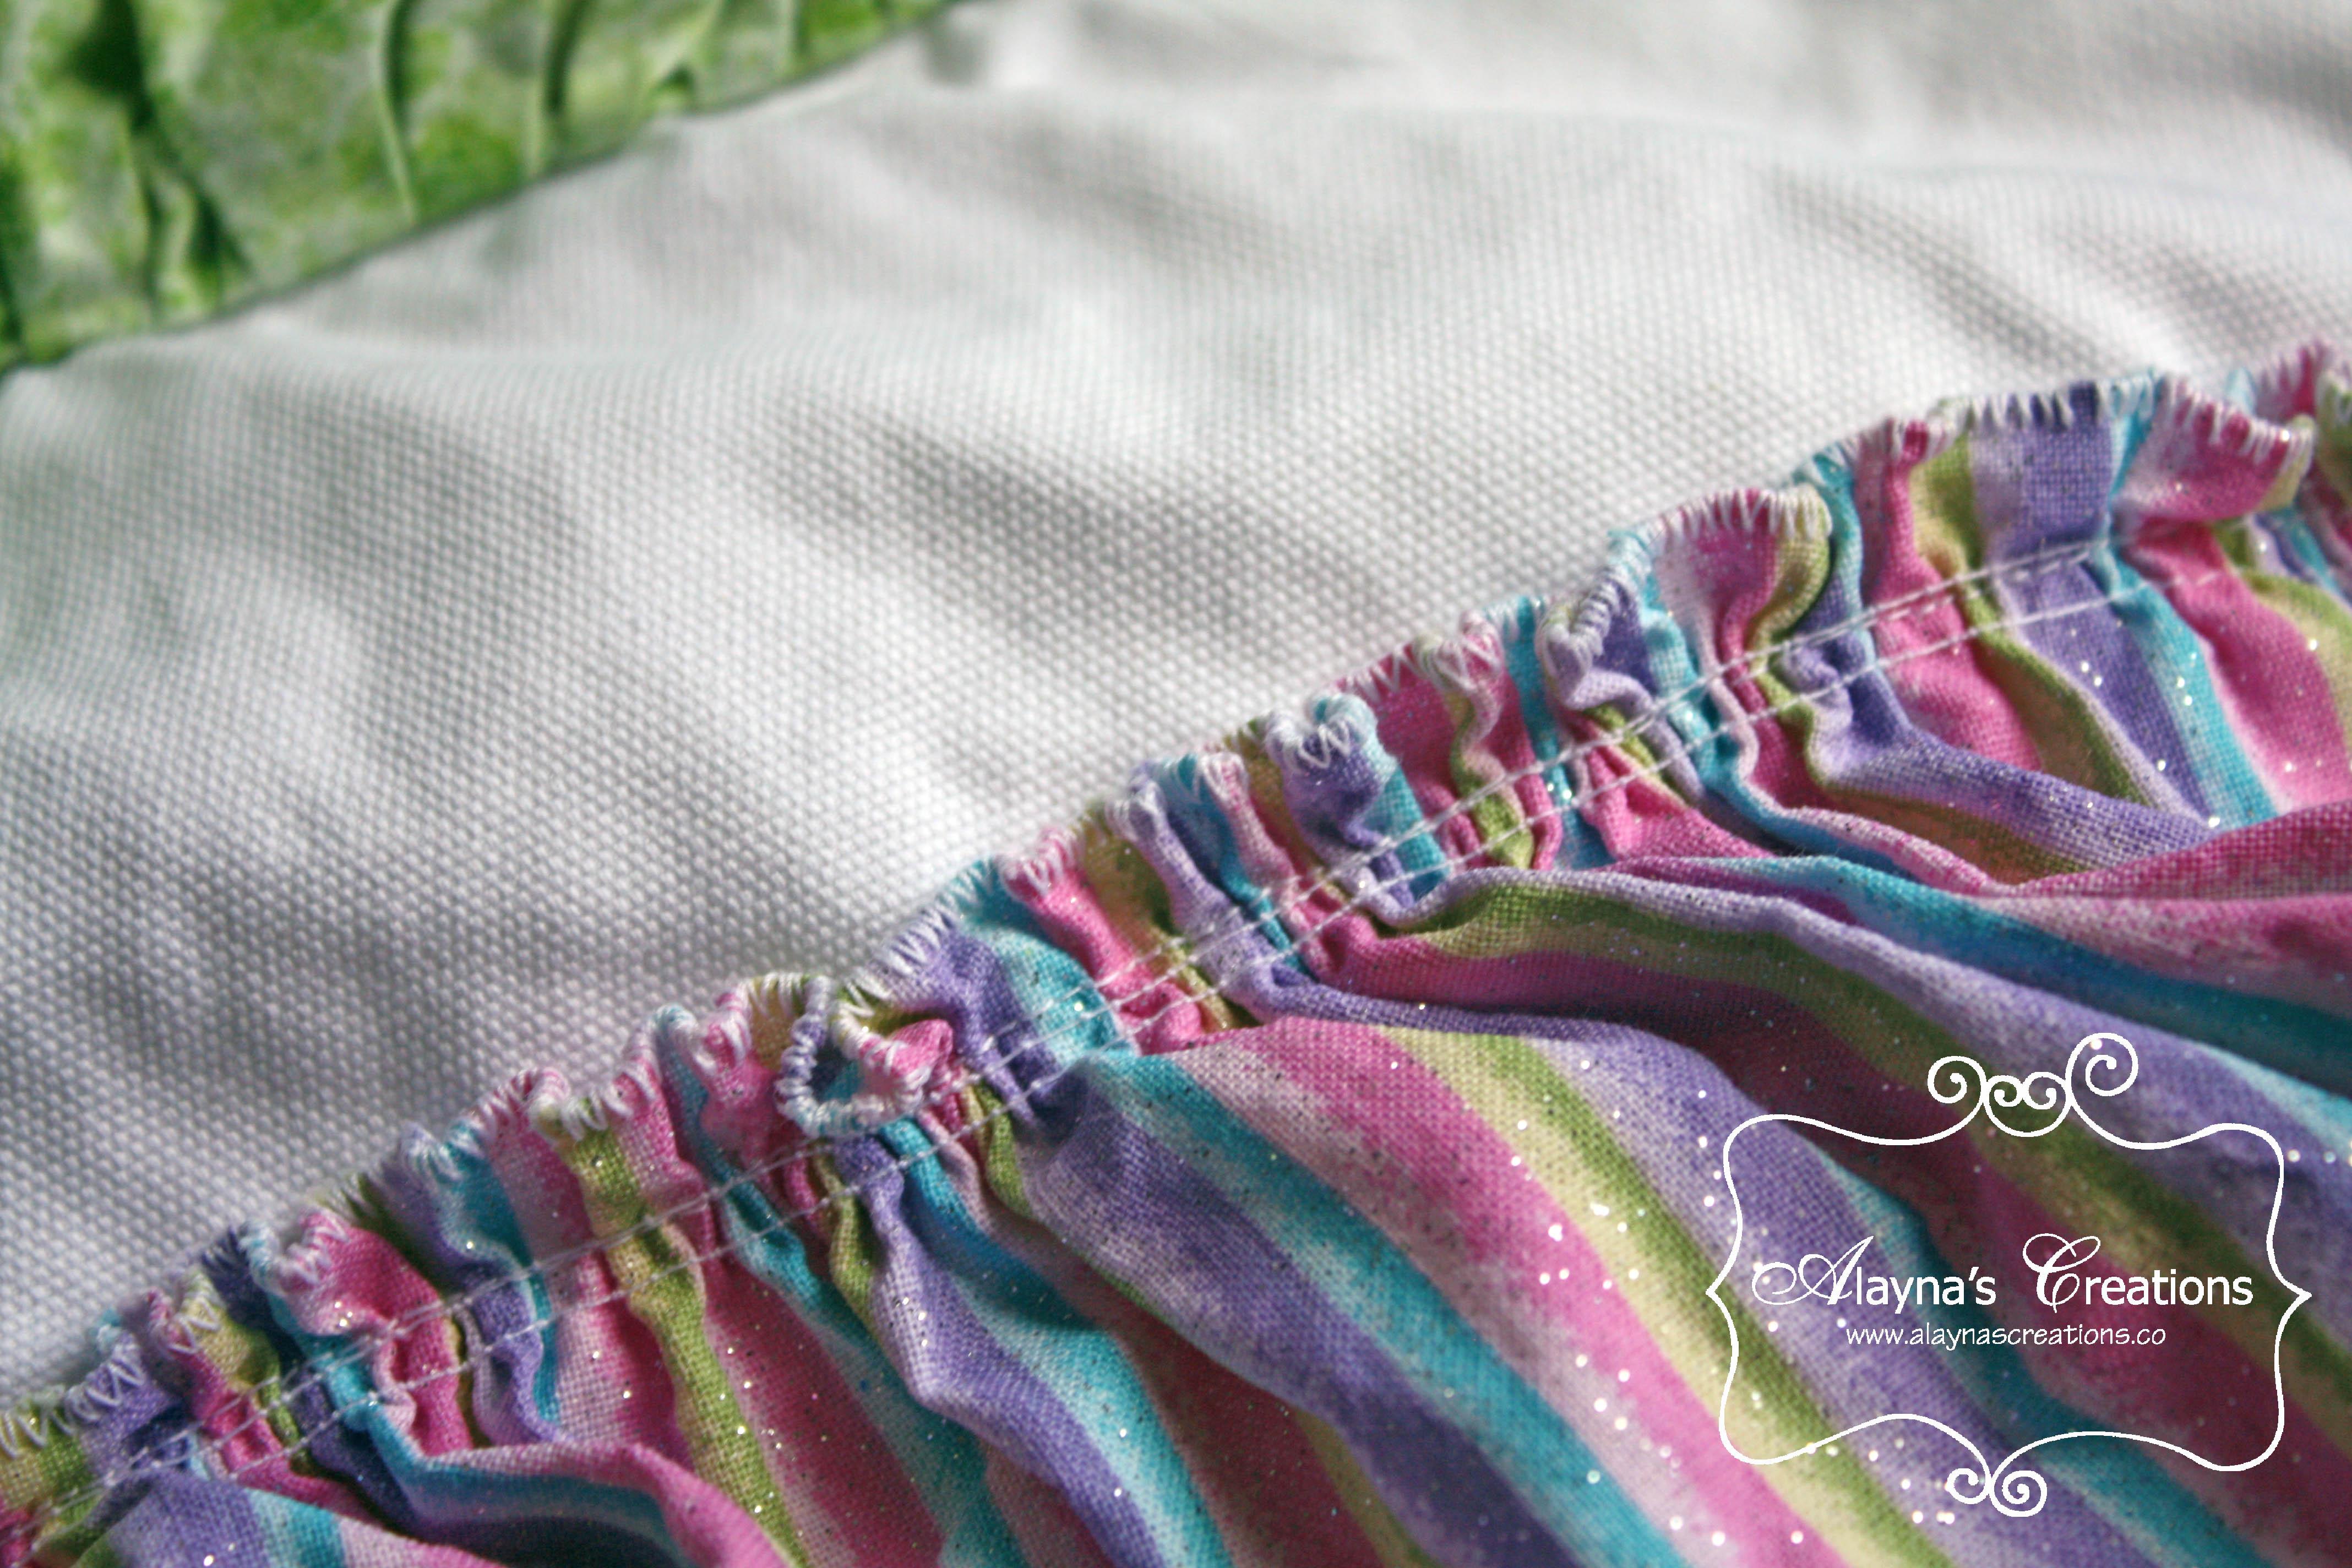 White ruffle apron amazon - Sewing Tutorial For Semi Homemade Ruffled Apron For Cupcake Wars Birthday Party Ruffle Detail